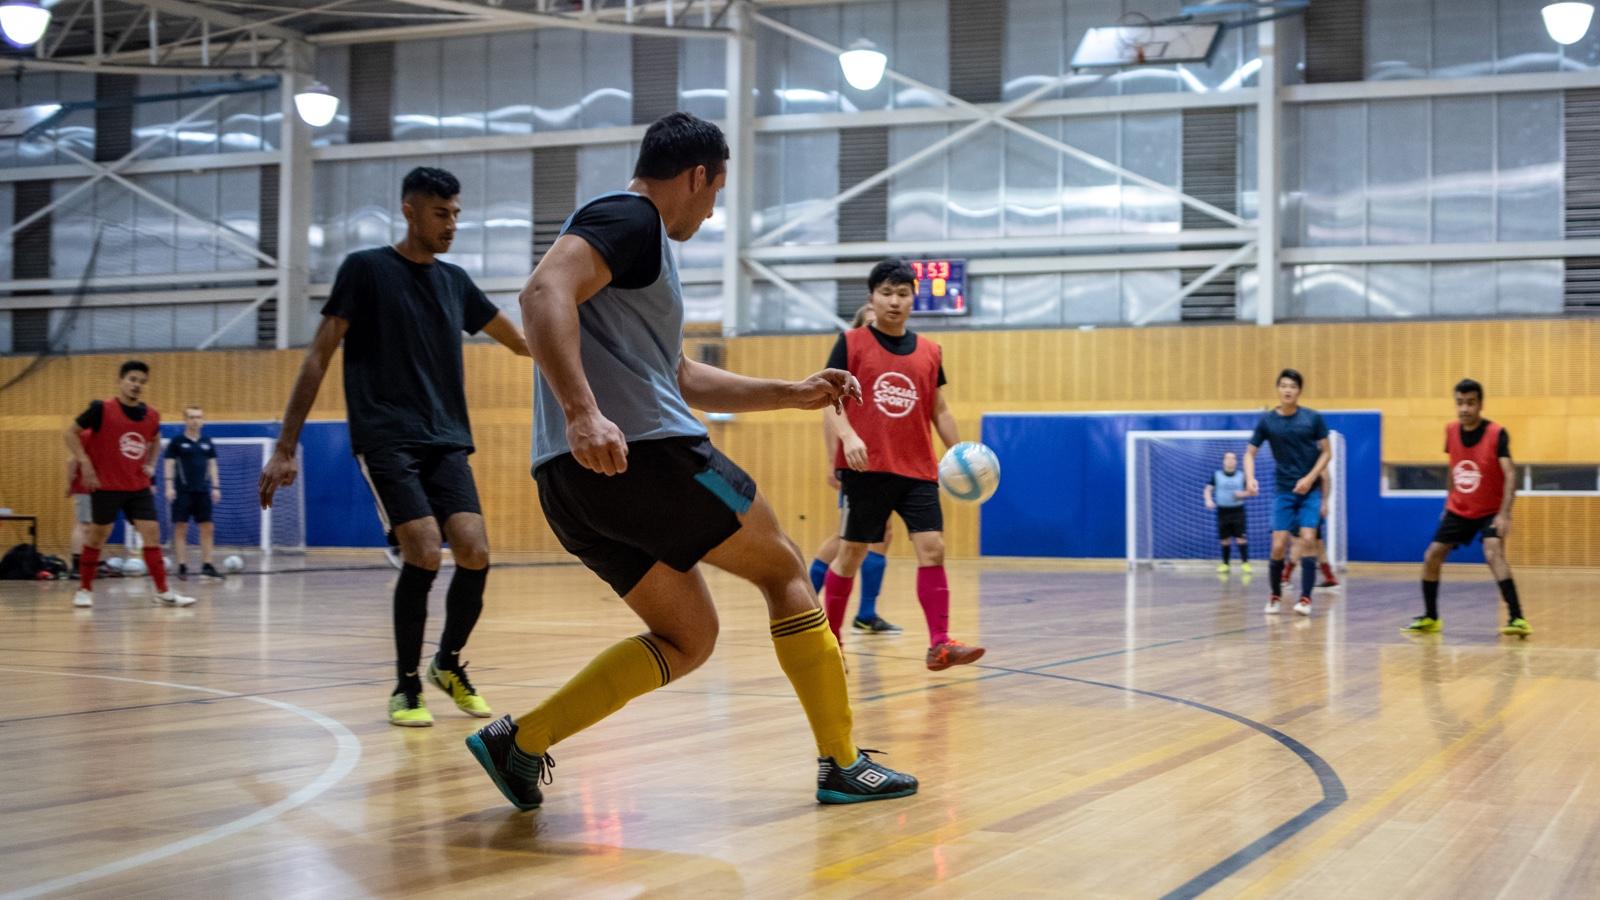 Epping Futsal | Social Futsal | Play Futsal Melbourne